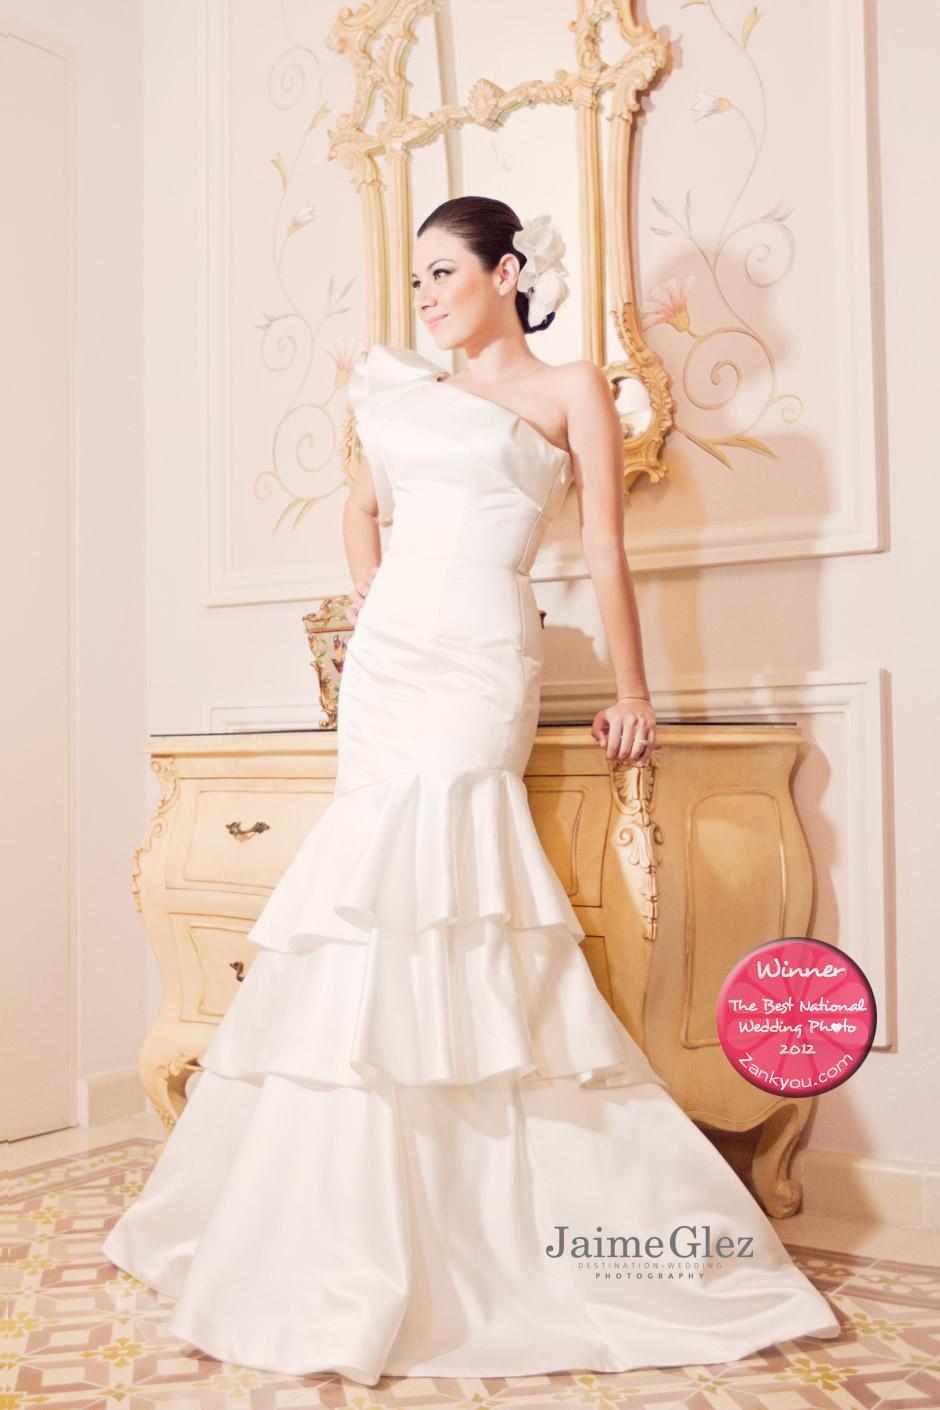 Jaime-Glez-is-Mexico-best-wedding-photographer-2012